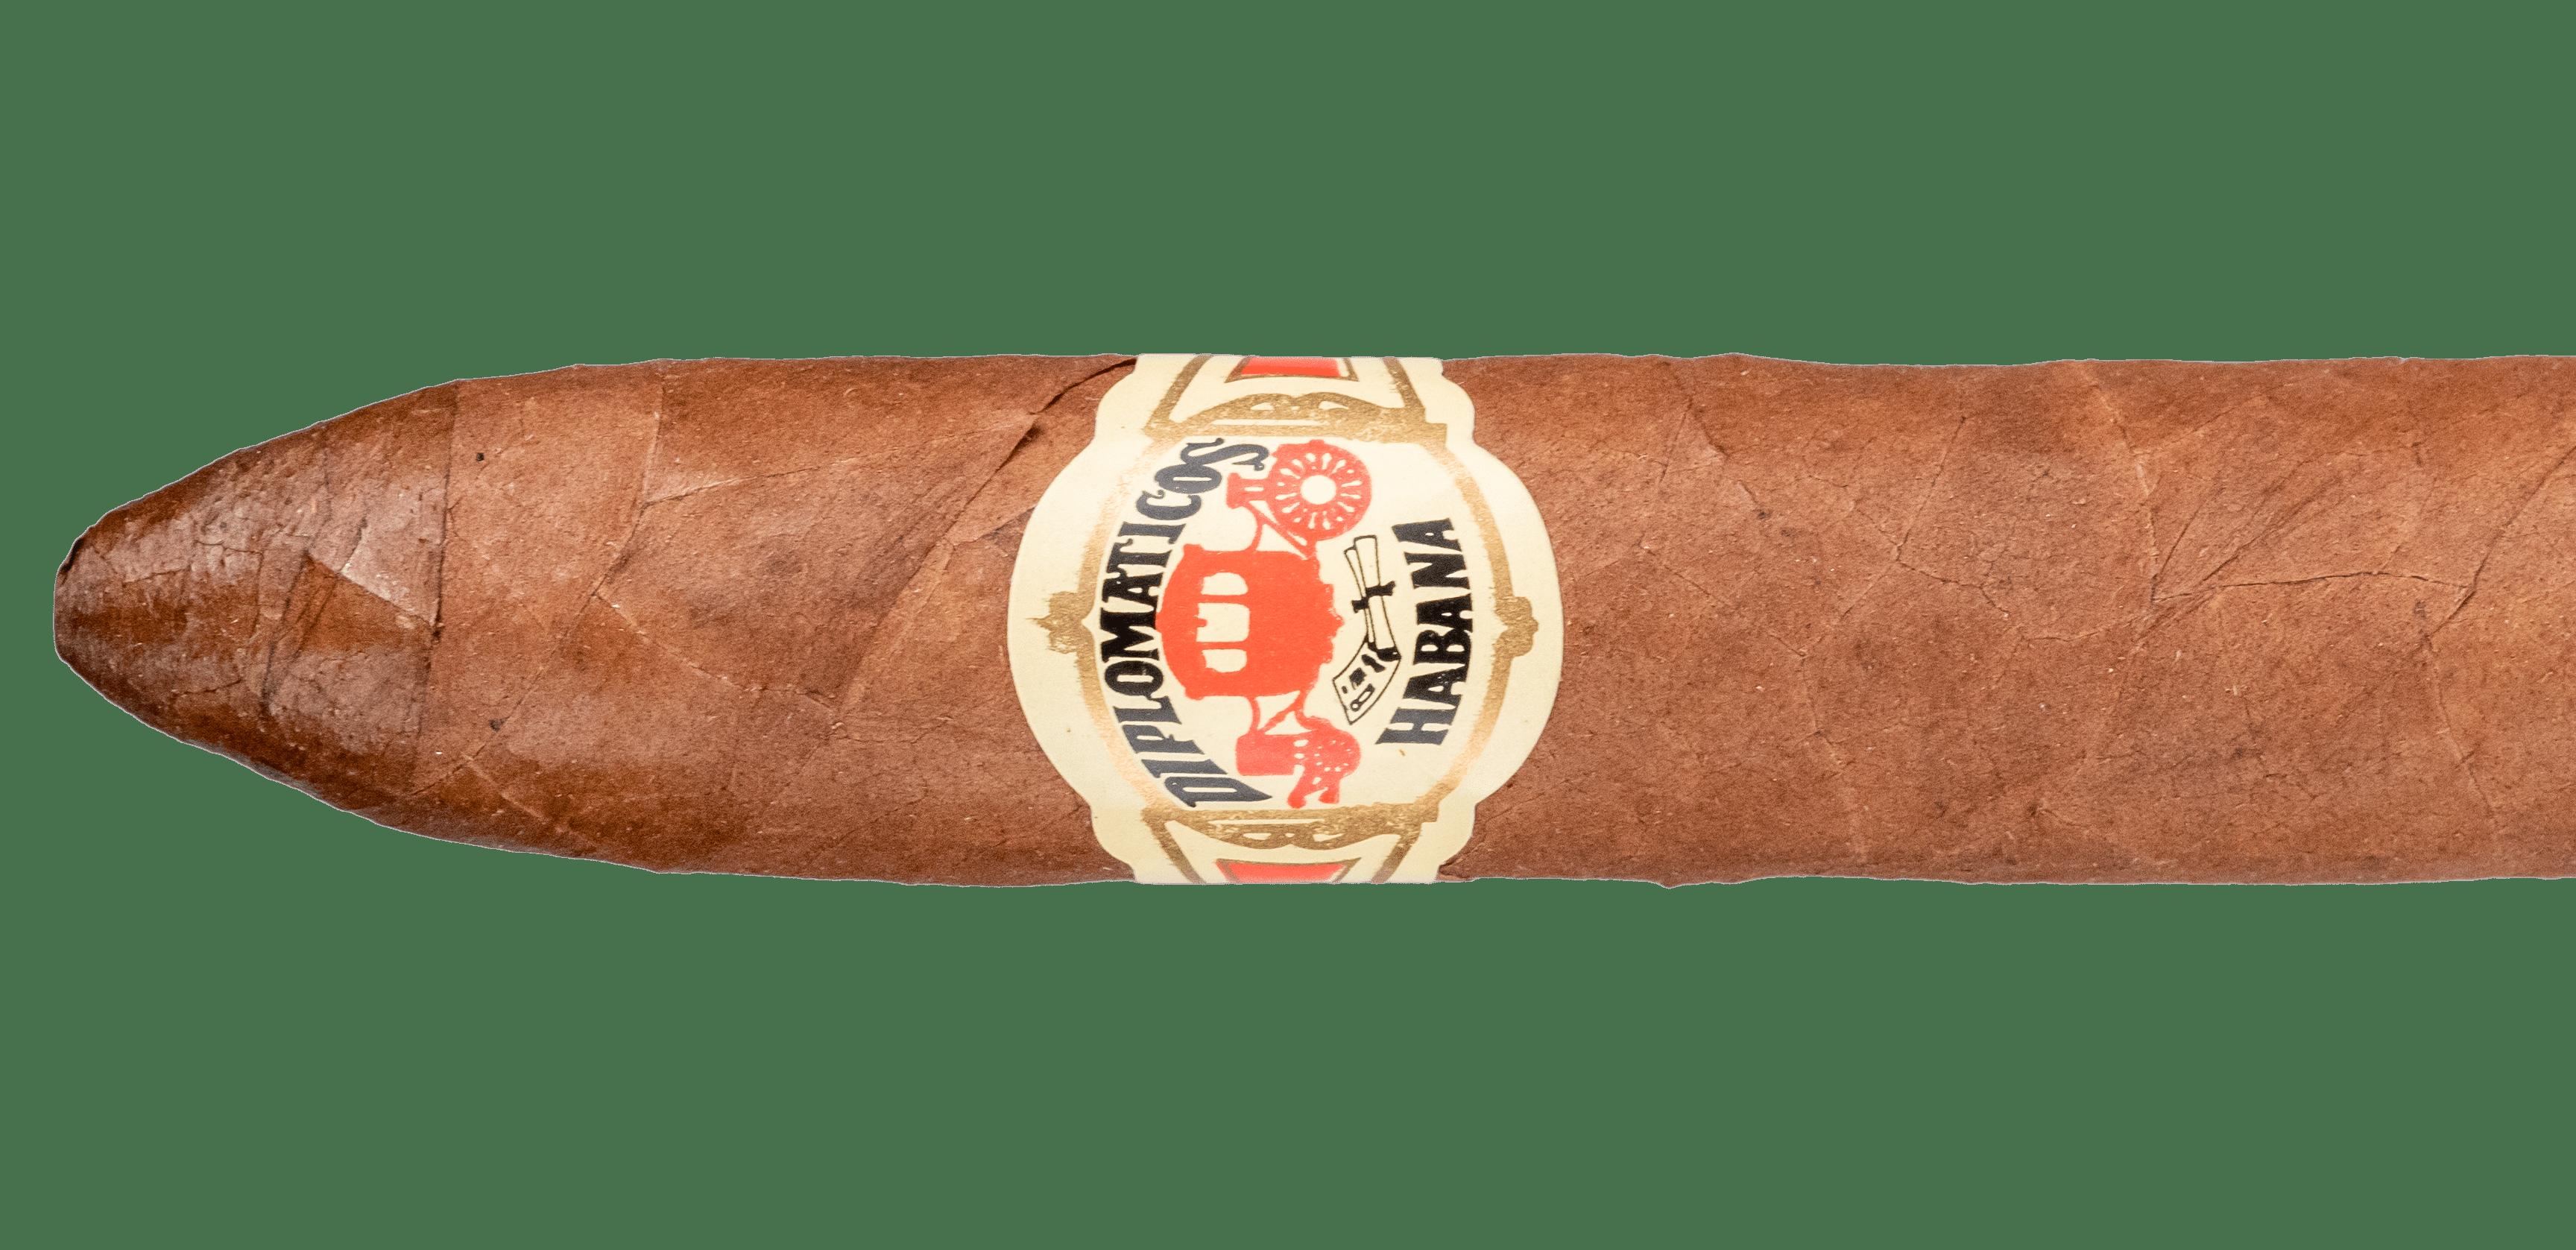 Diplomáticos No. 2 - Blind Cigar Review